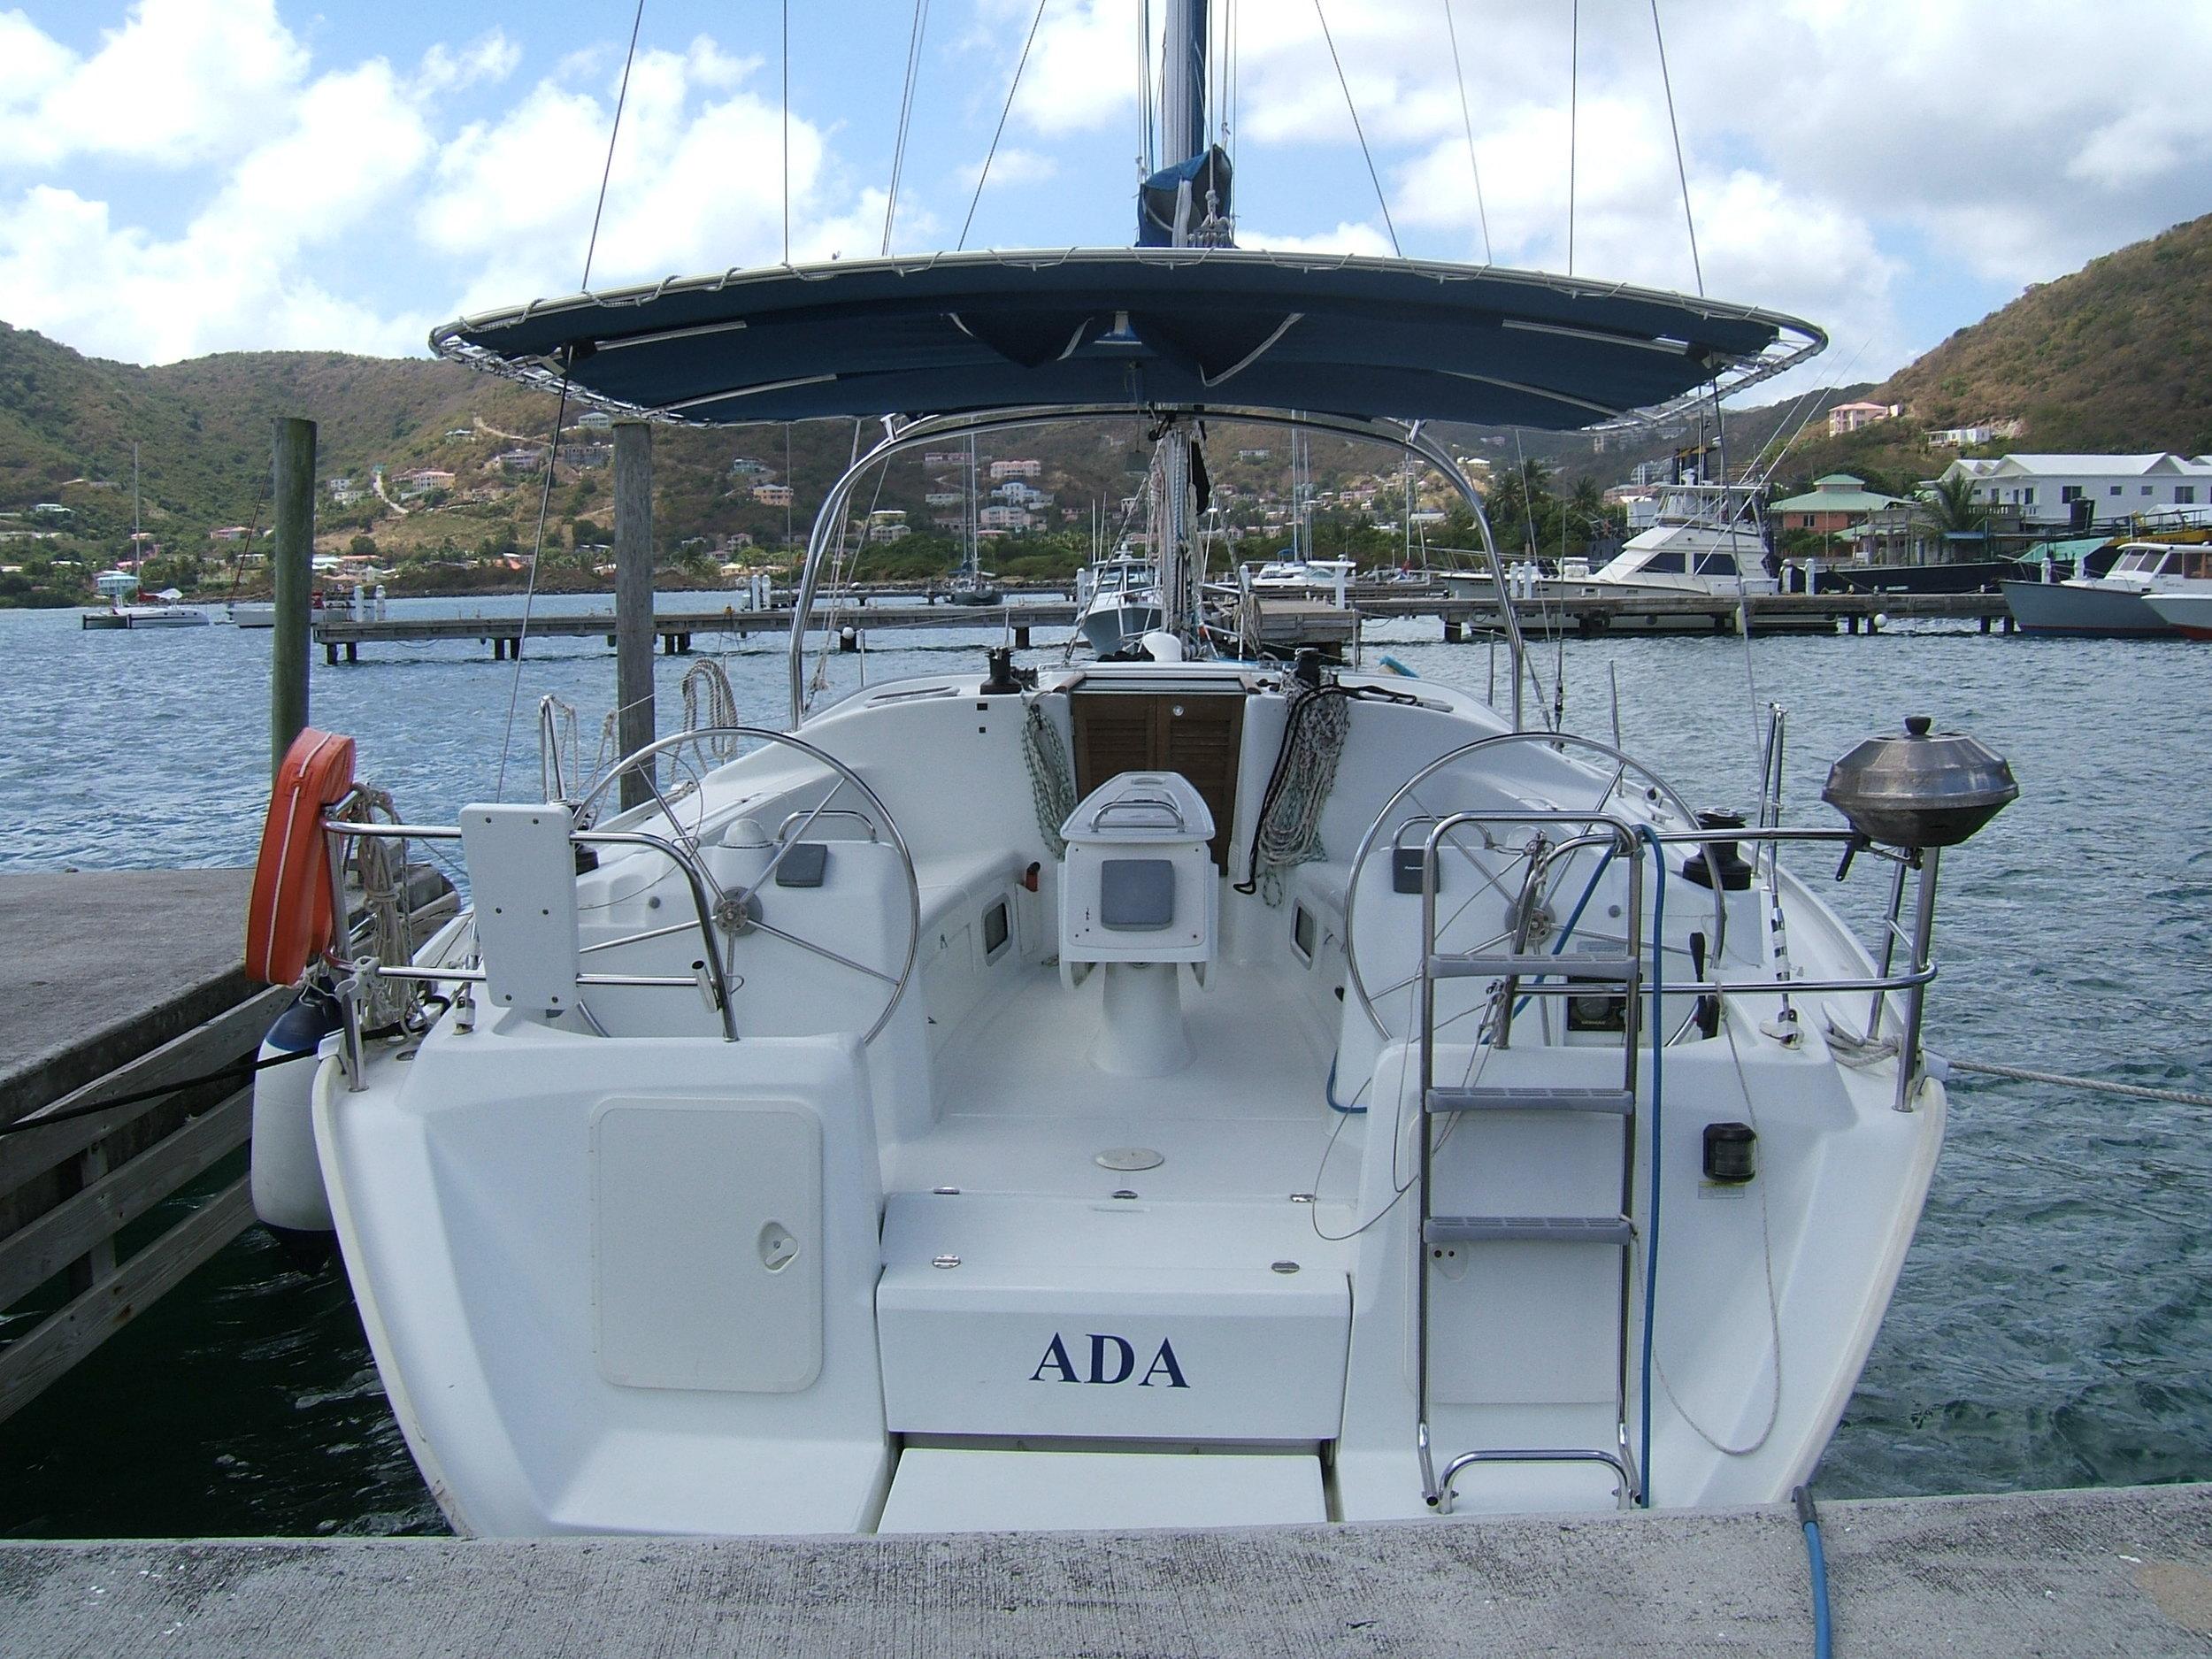 ADA Aft Name 03-12.JPG